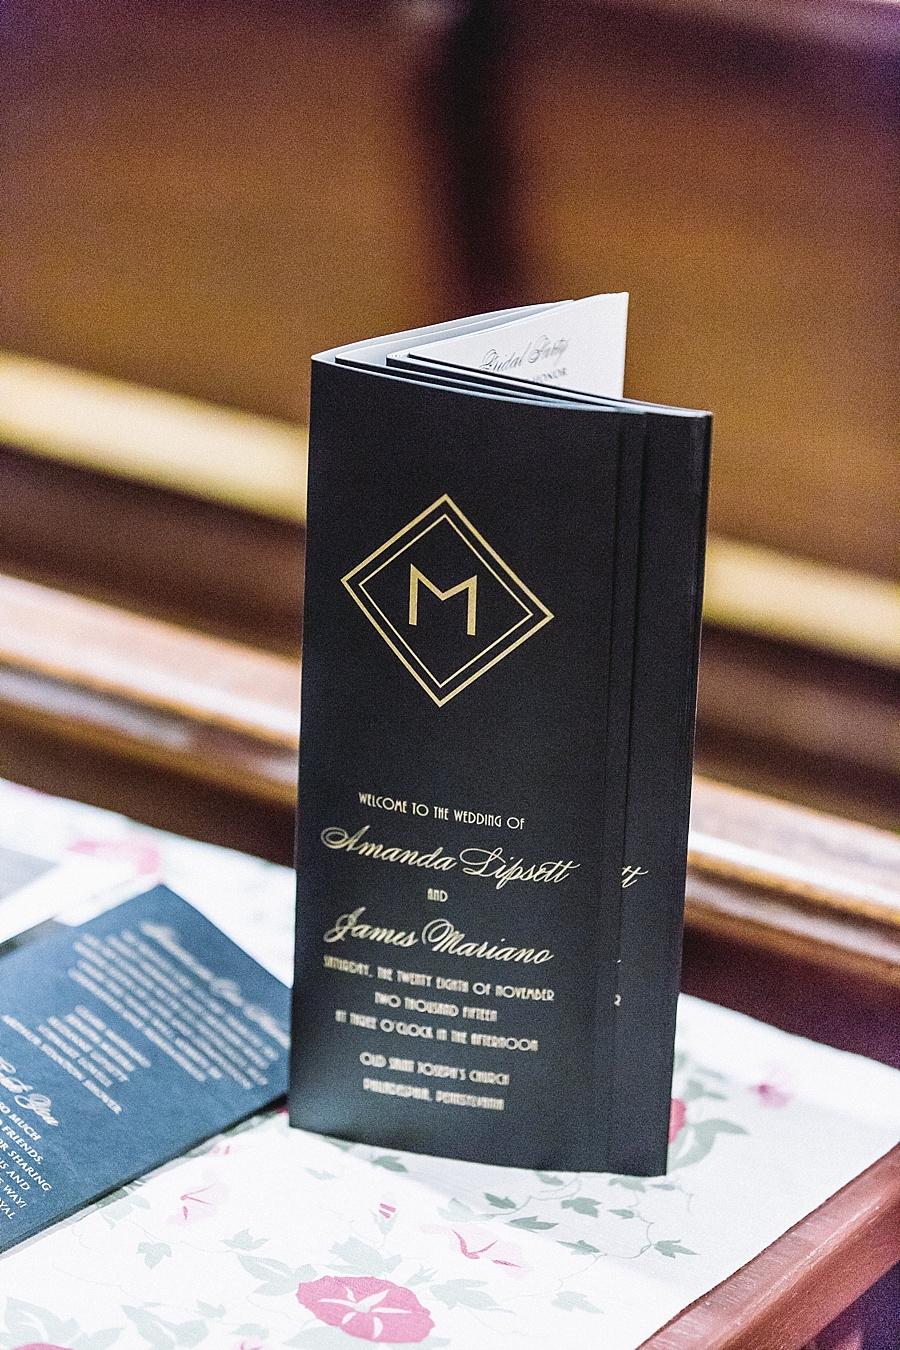 Karmapants_Photography_April_Lynn_Designs_Ballroom_at_the_Ben_Finley_Catering_Luxe_Elegant_Wedding_Art_Deco_Gatsby_Gold_Black_Ceremony-105